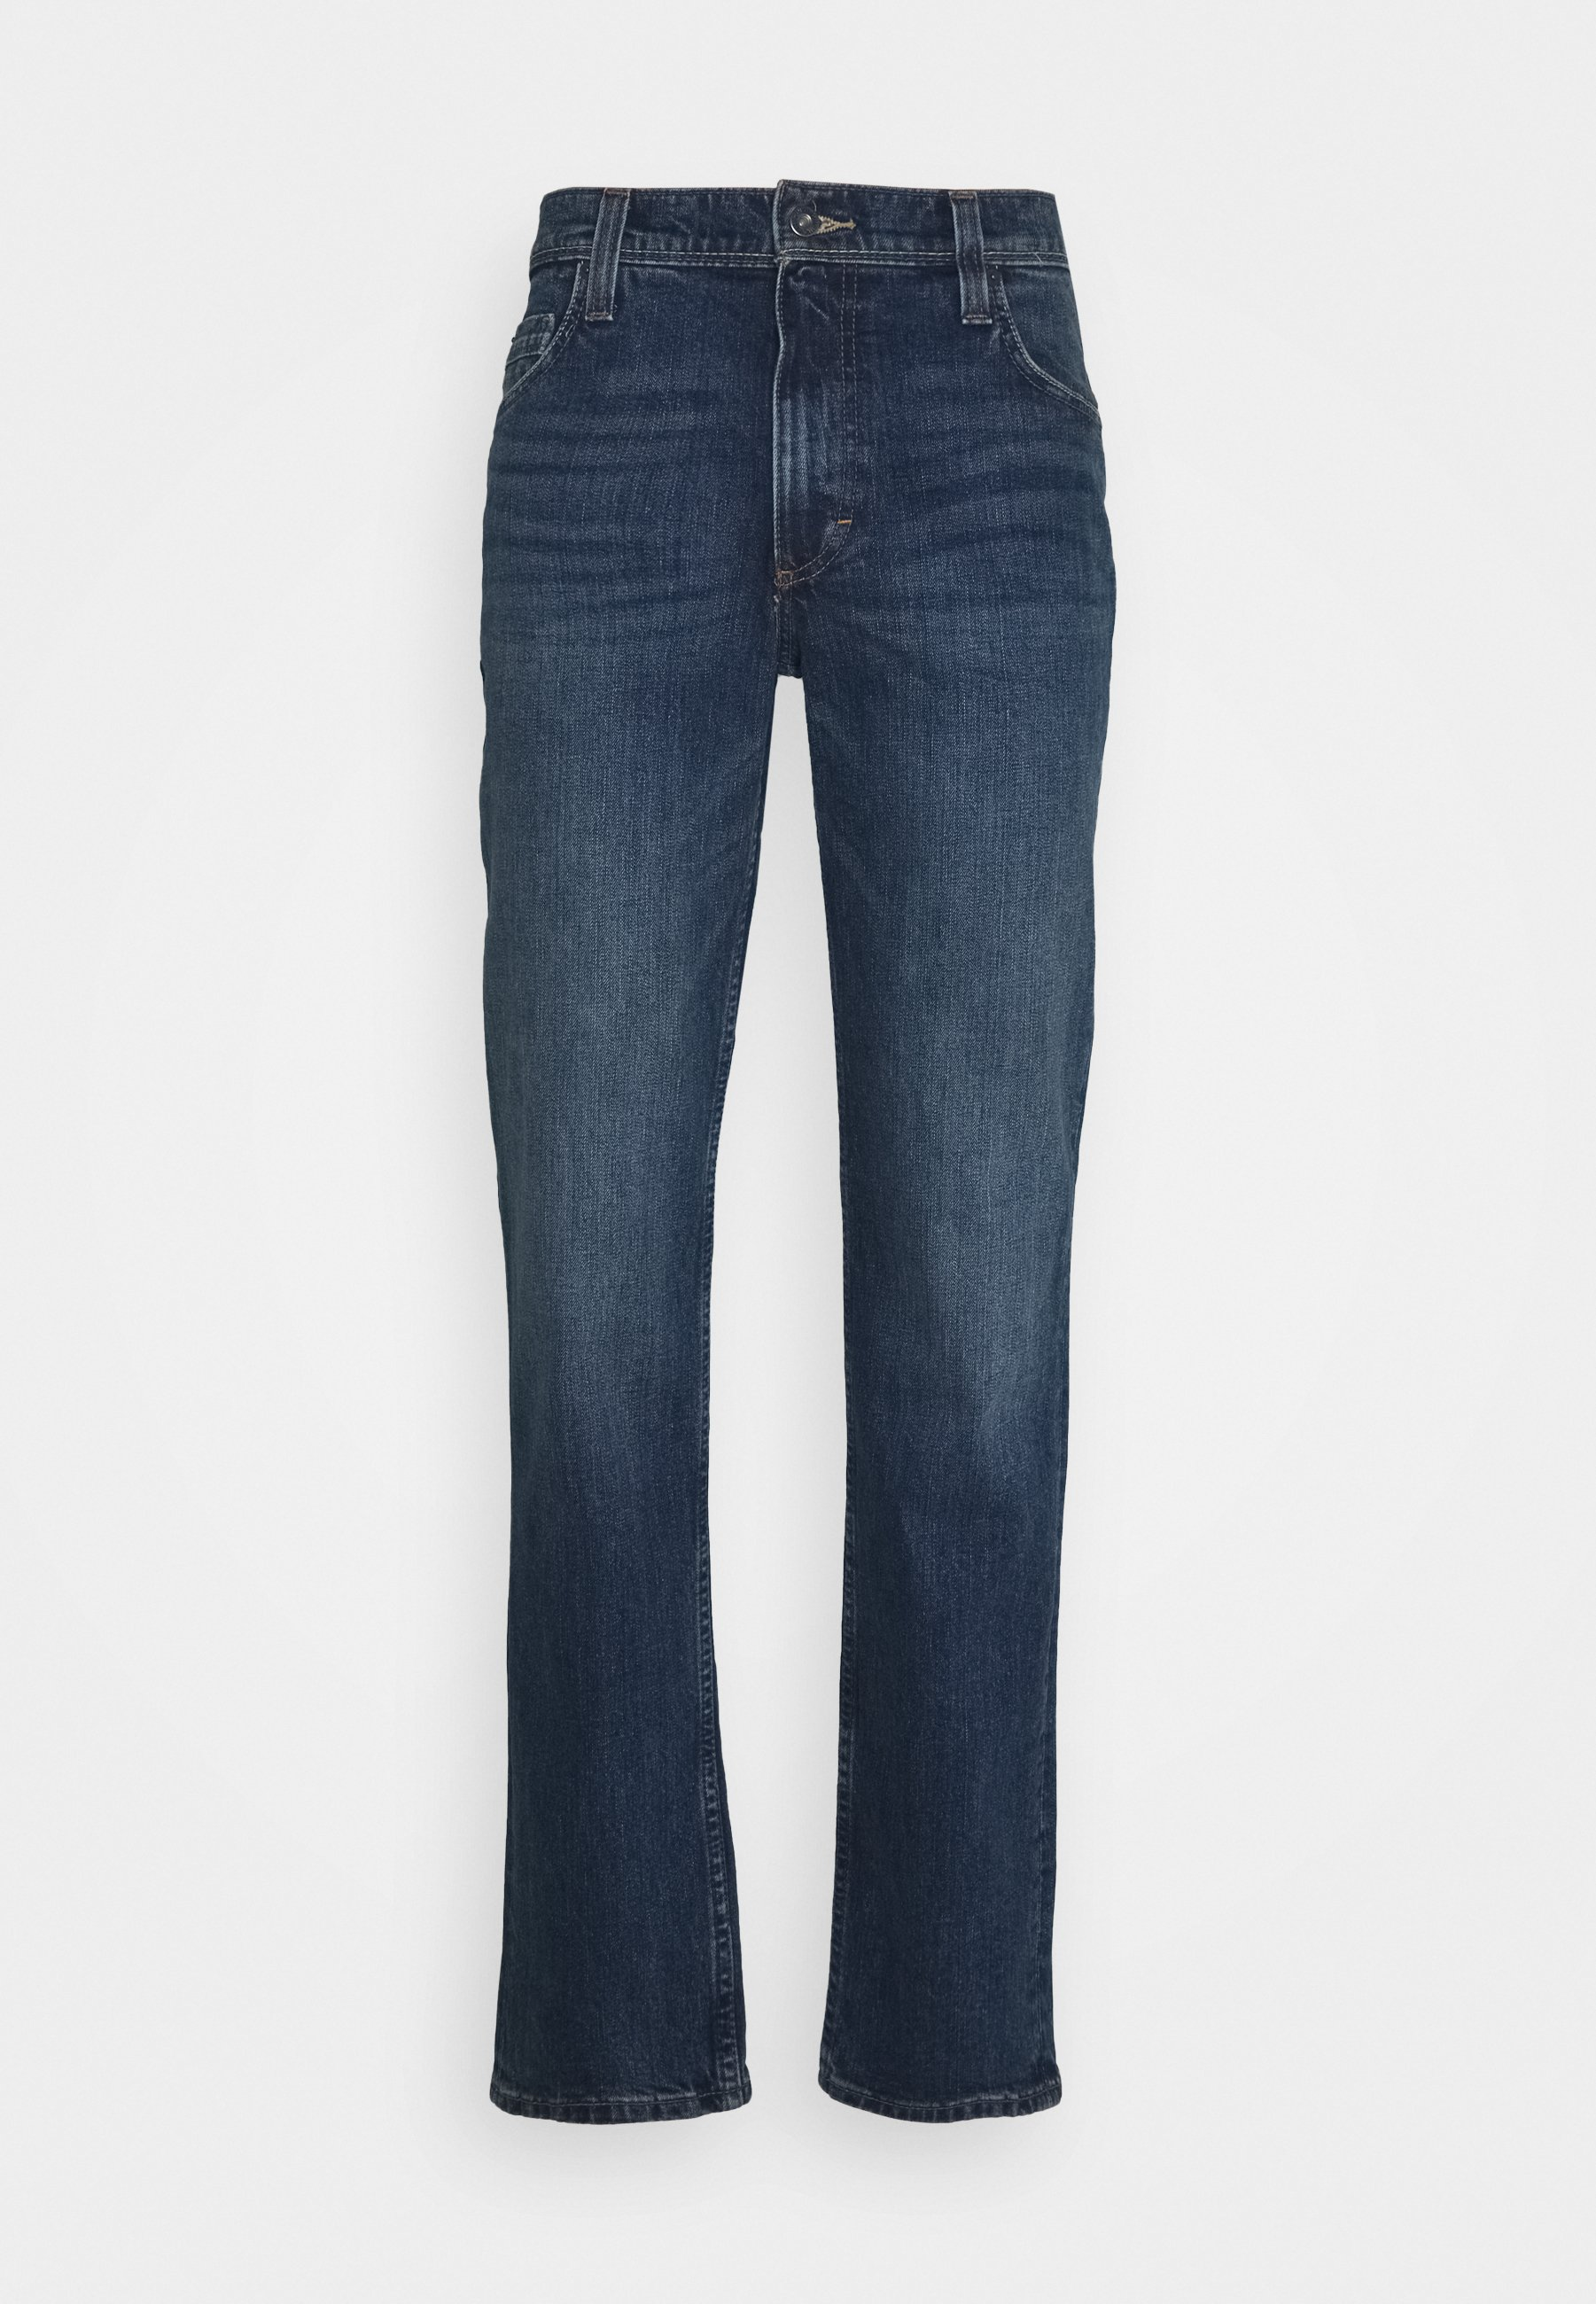 WASHINGTON Jeans Straight Leg blue denim